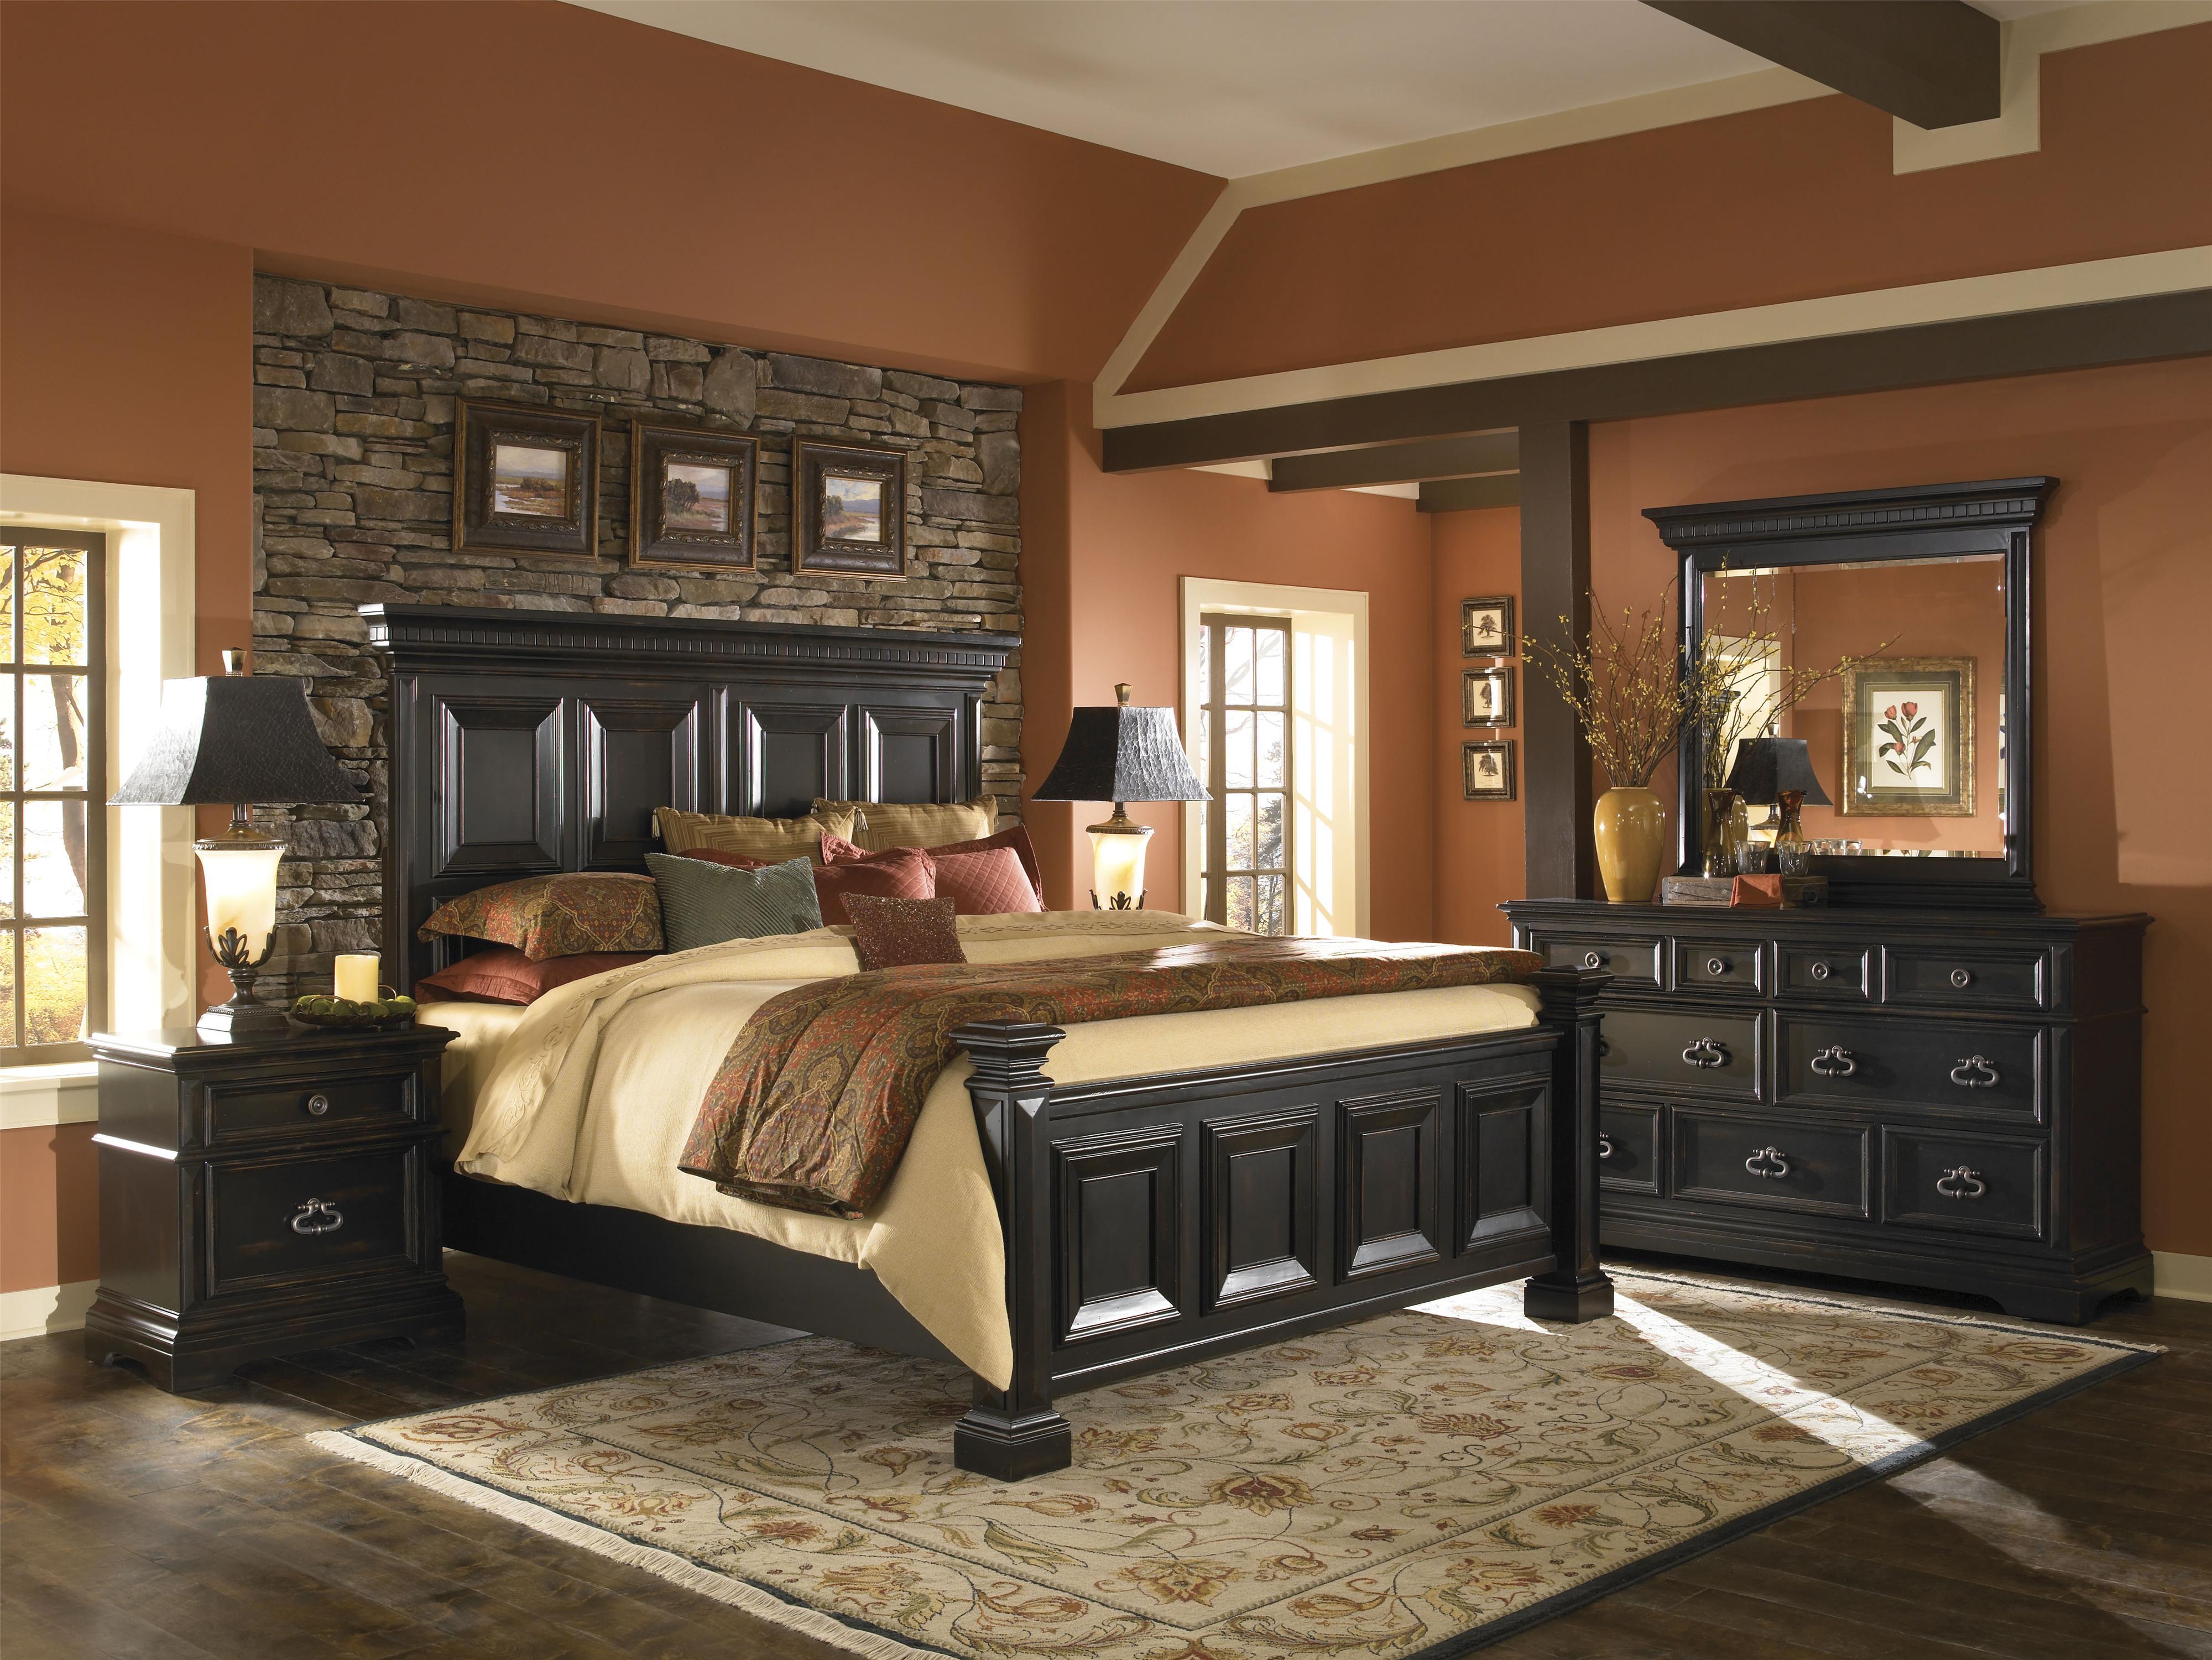 Pulaski Furniture Brookfield Queen Bedroom Group - Item Number: 993 Q Bedroom Group 1